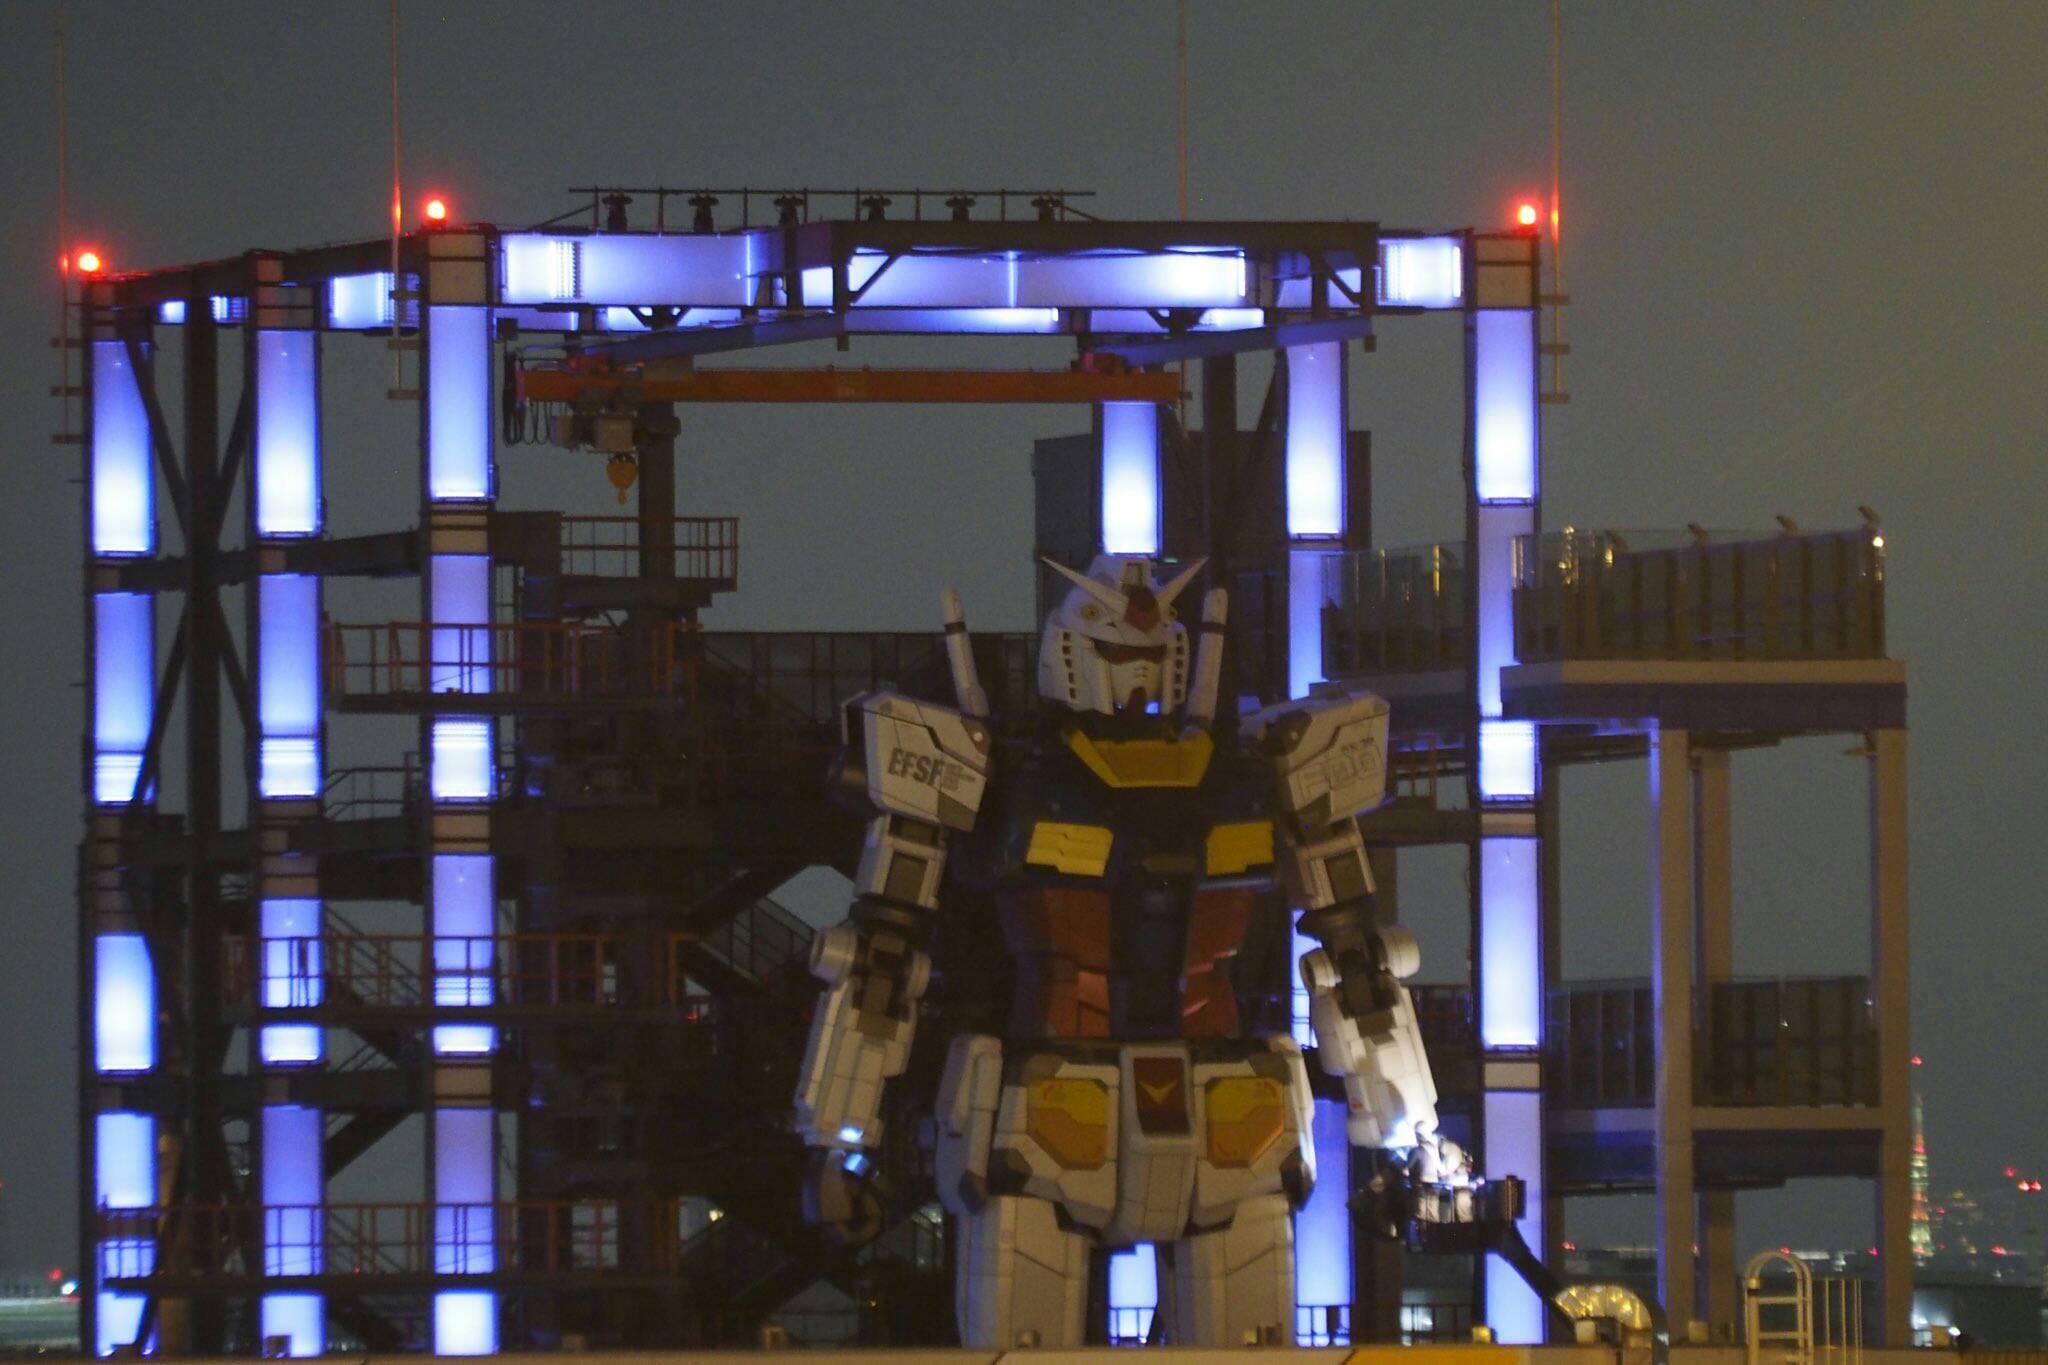 Gundam Yokohama test